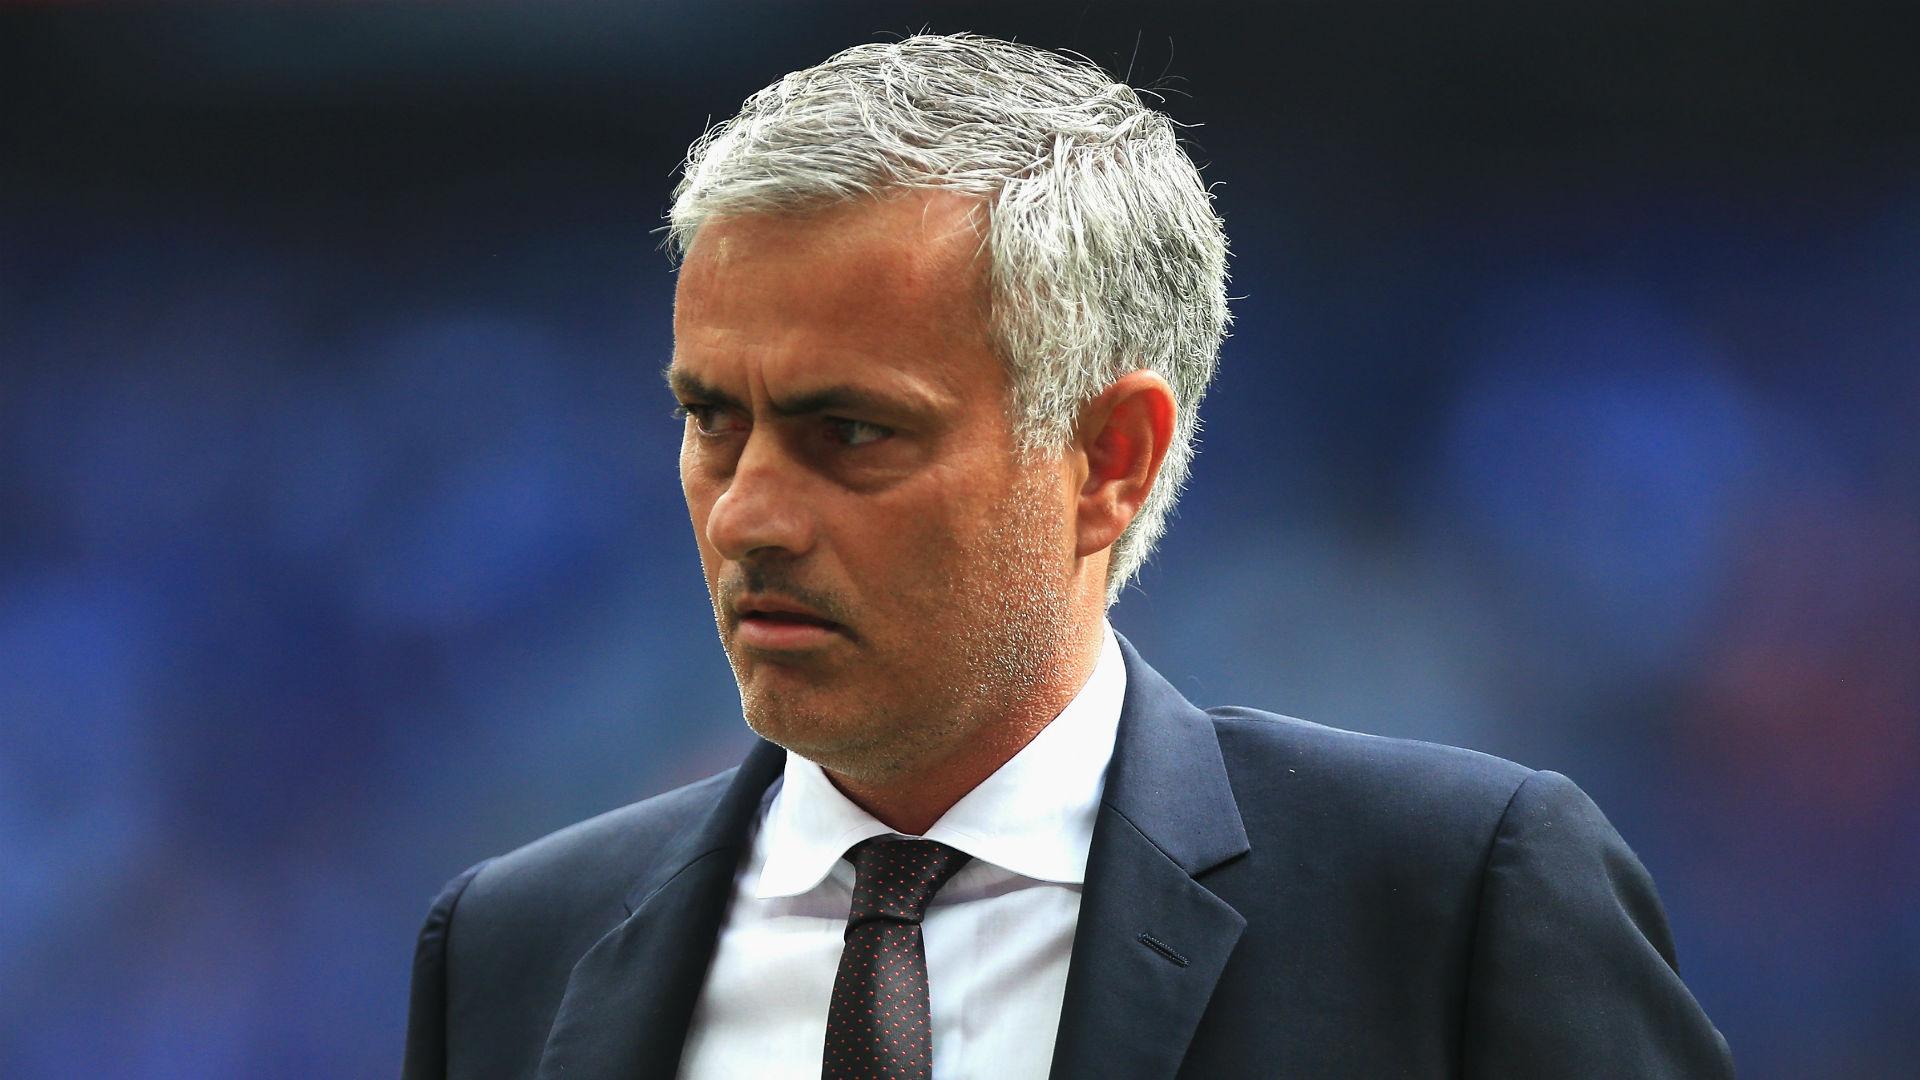 Man United lucky to have Pogba, says Rashford